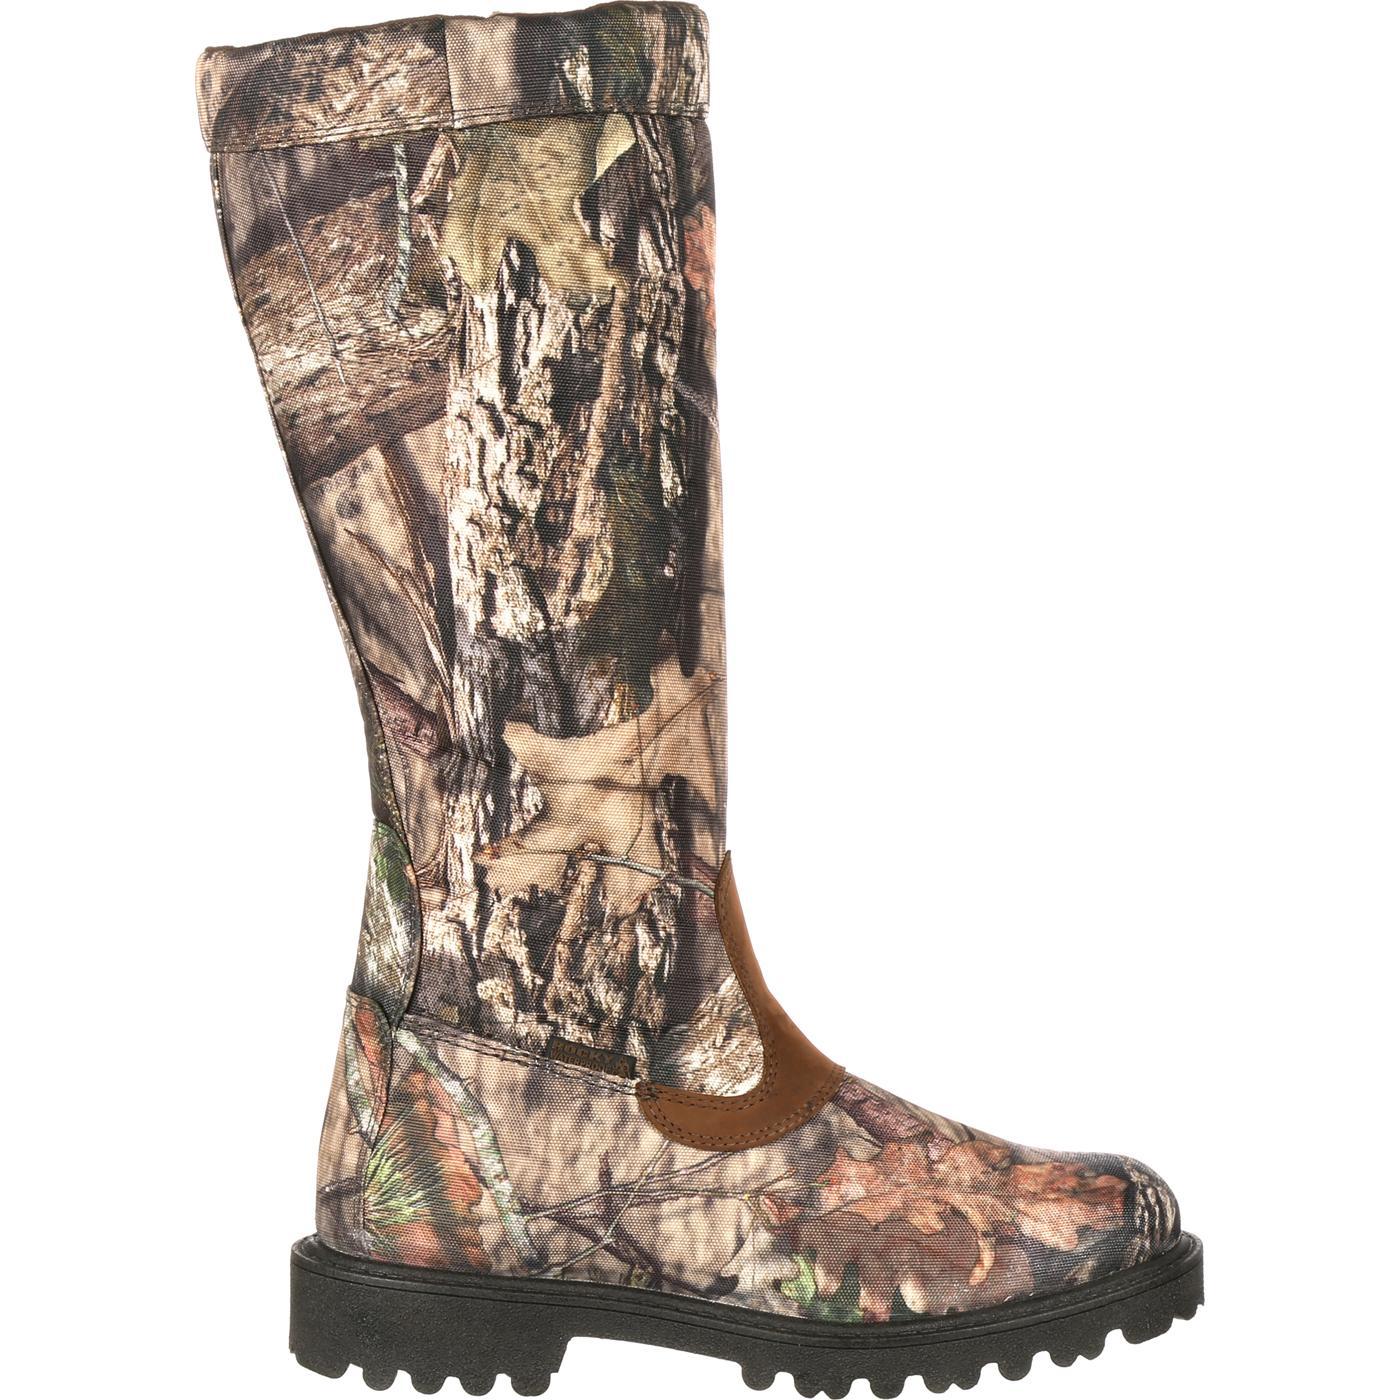 3ea9b1d8895b3 Rocky Low Country Waterproof Camo Snake Boots, #RKS0232